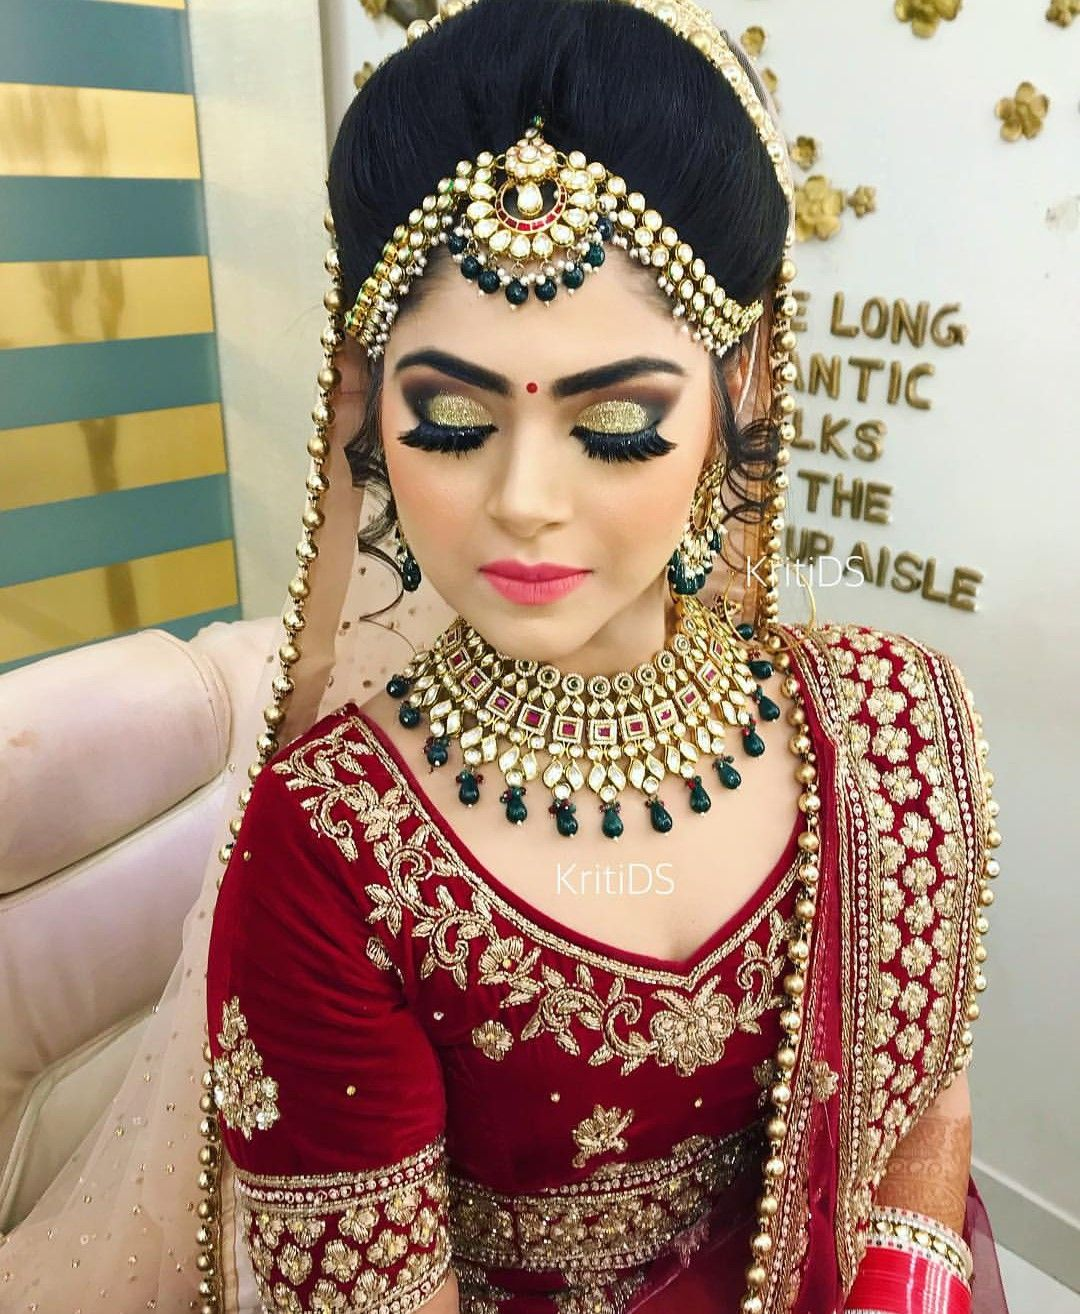 Shikachand Bridal Jewellery Indian Indian Bridal Makeup Indian